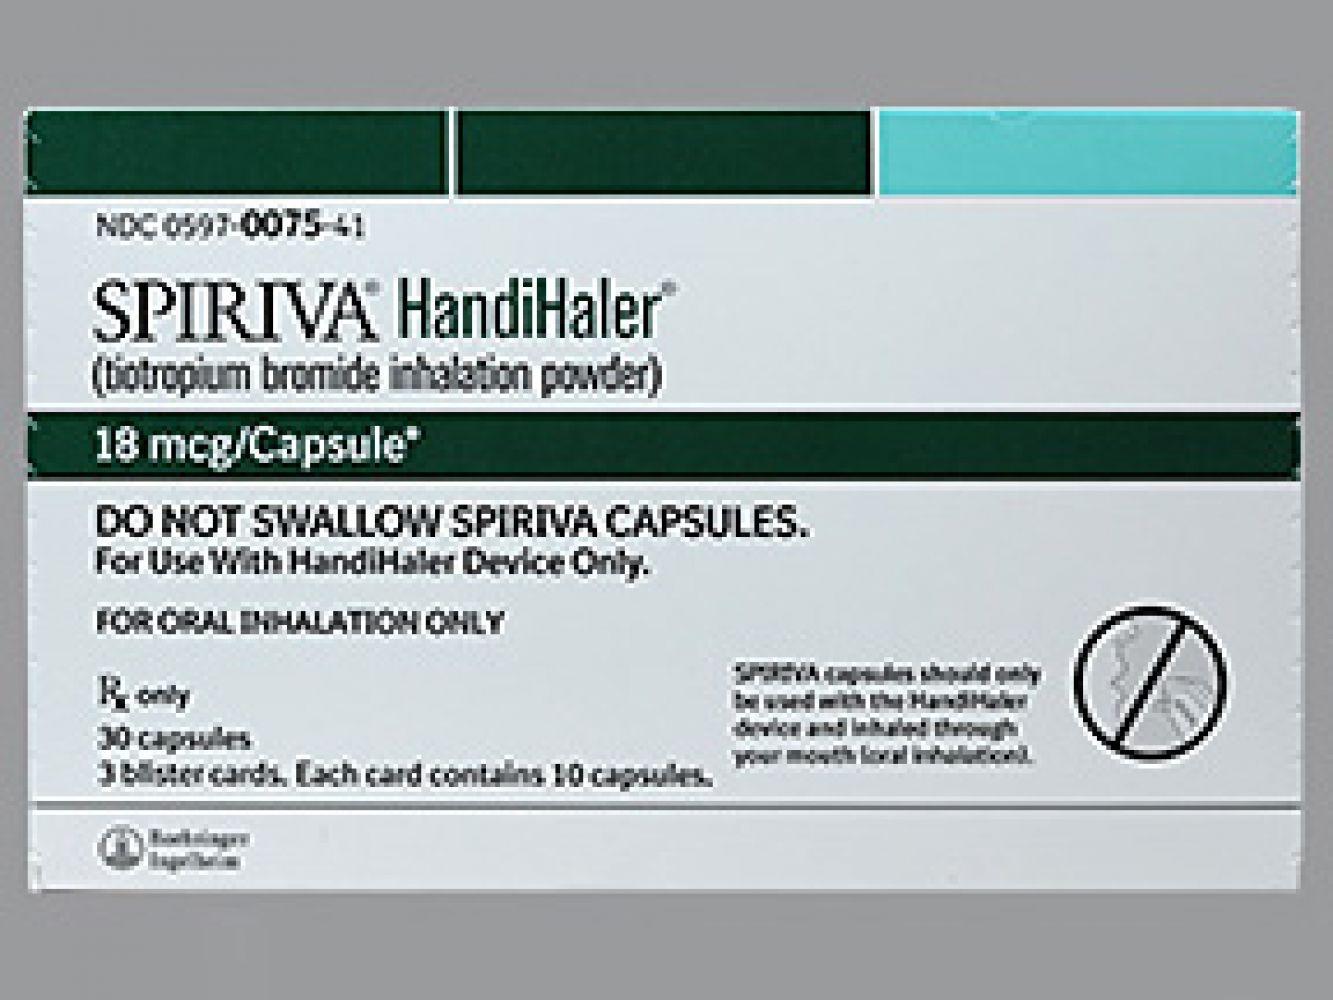 Spiriva 18 Mcg Cp-Handihaler - Free Printable Spiriva Coupons